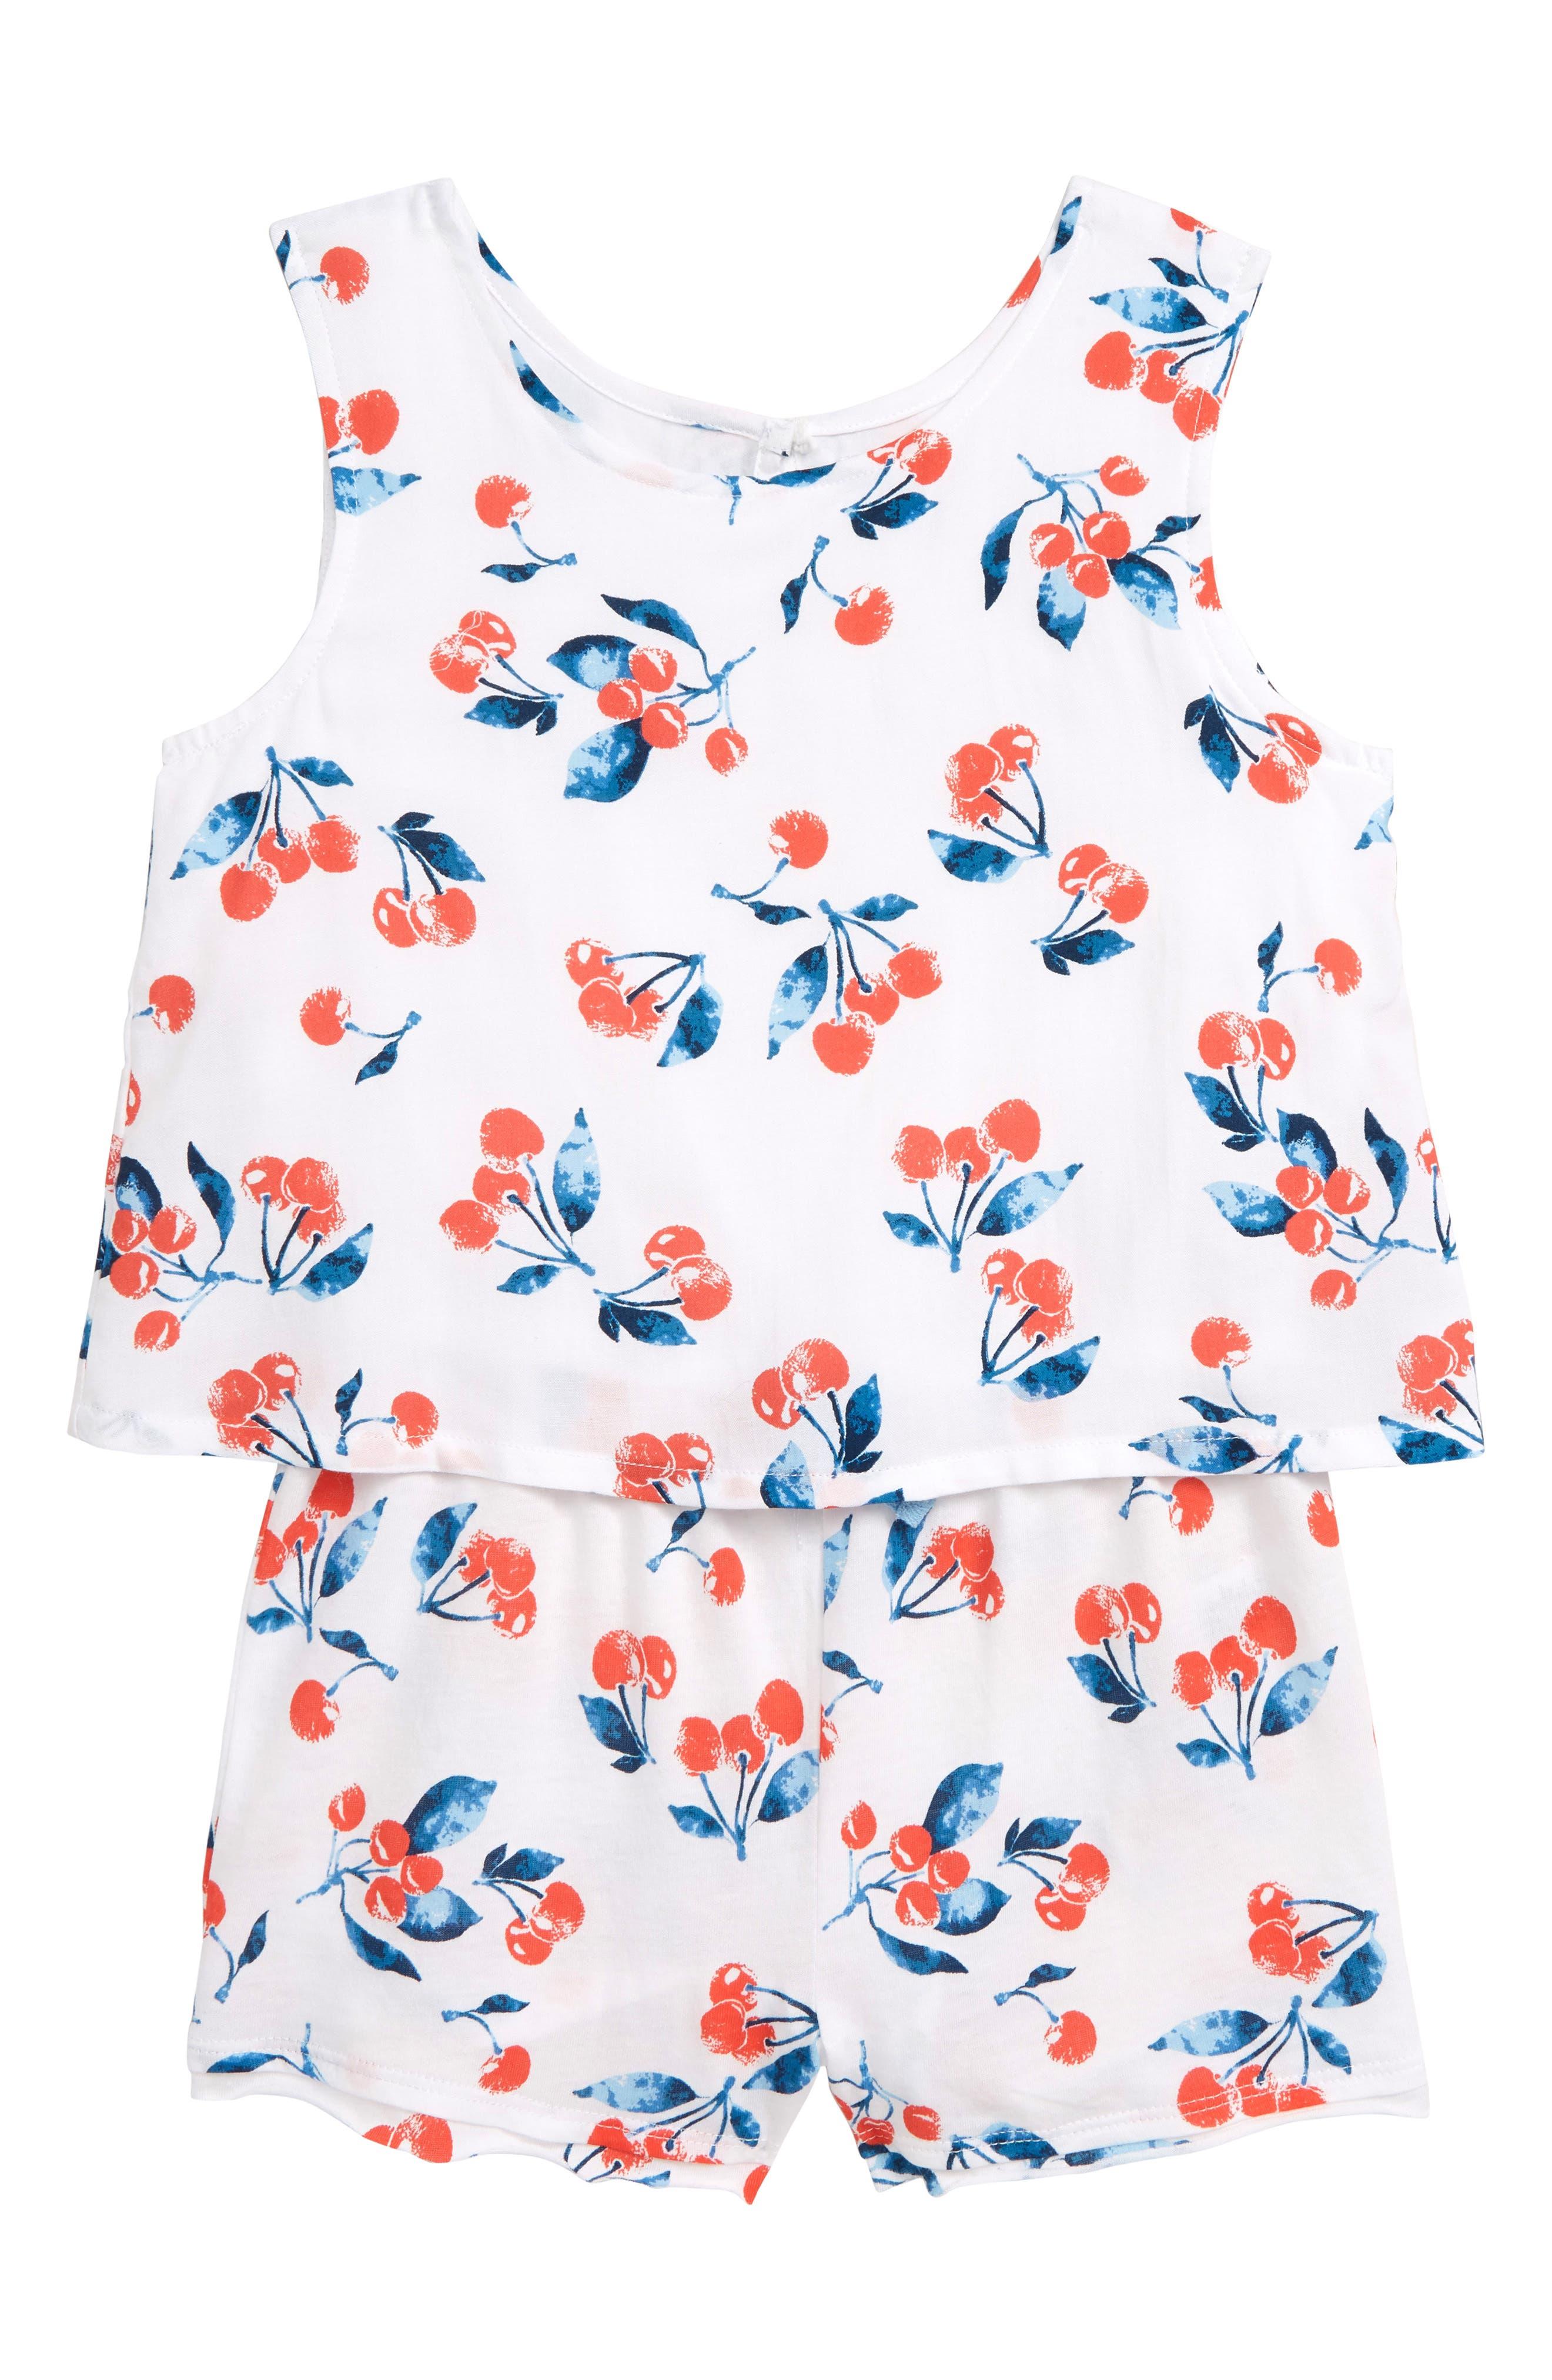 SPLENDID Cherry Print Romper, Main, color, WHITE VERANDA